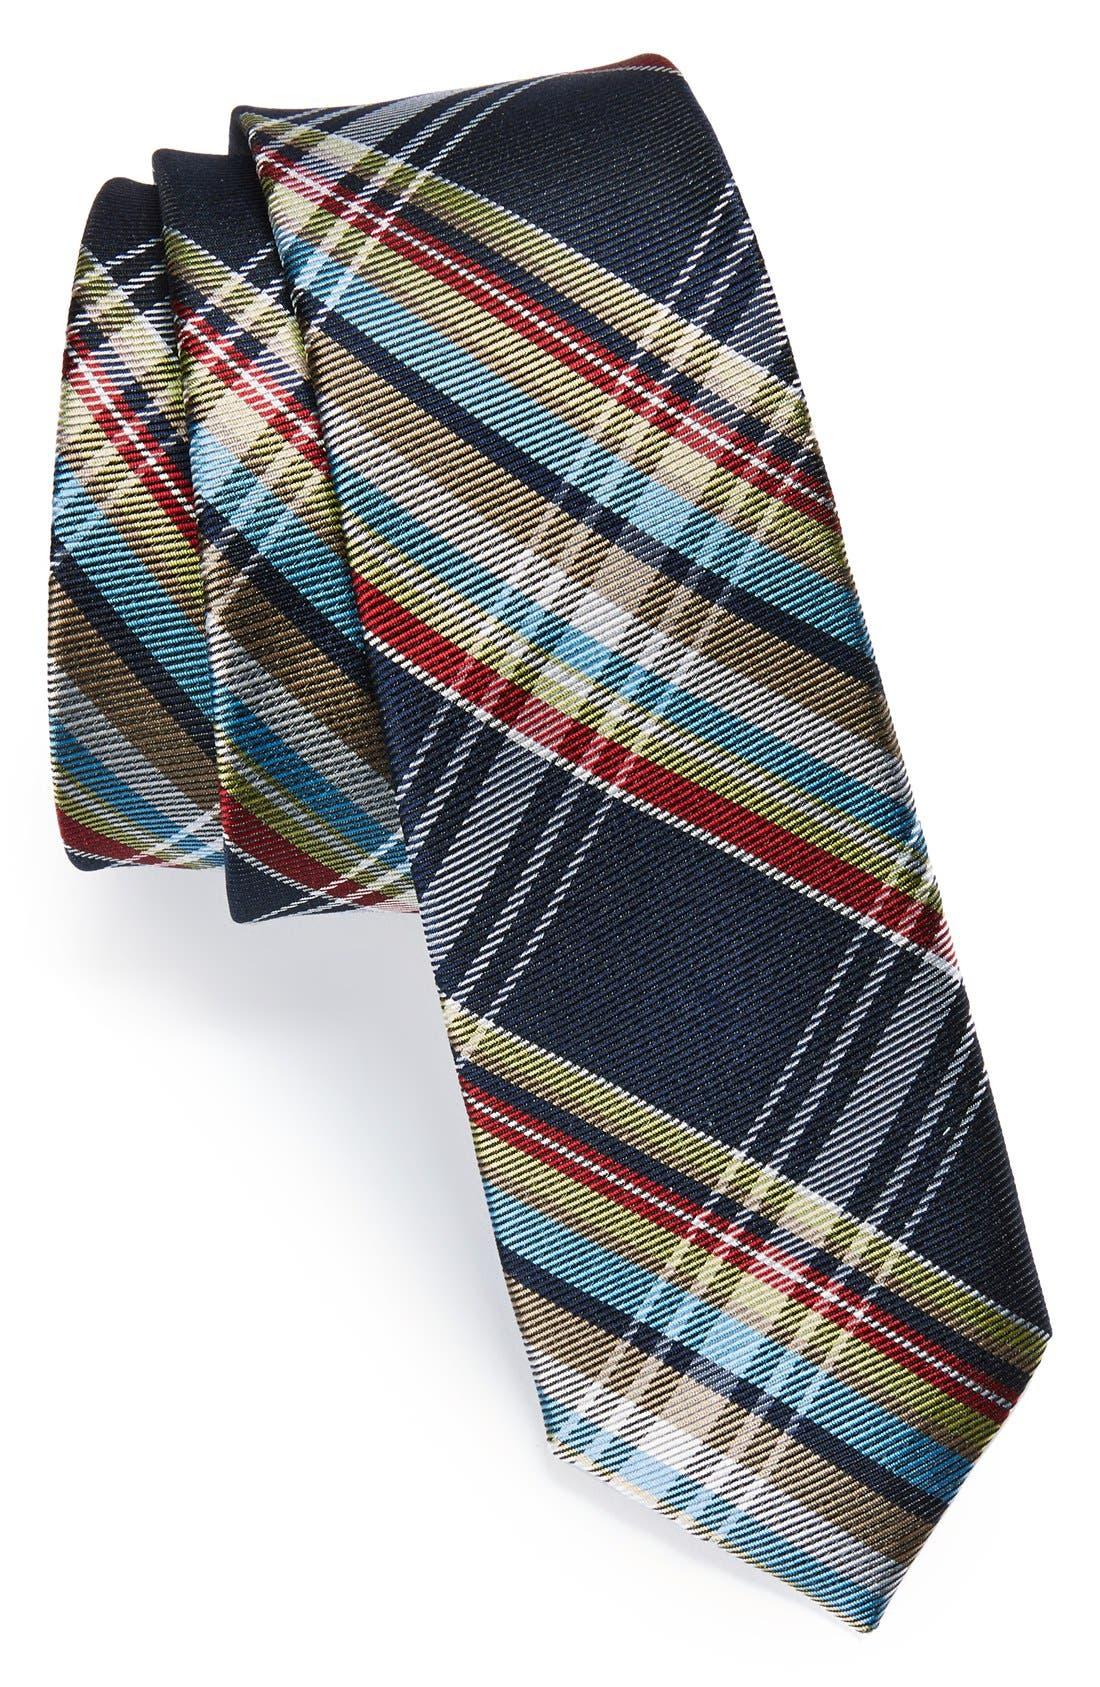 Main Image - Original Penguin Woven Silk Tie